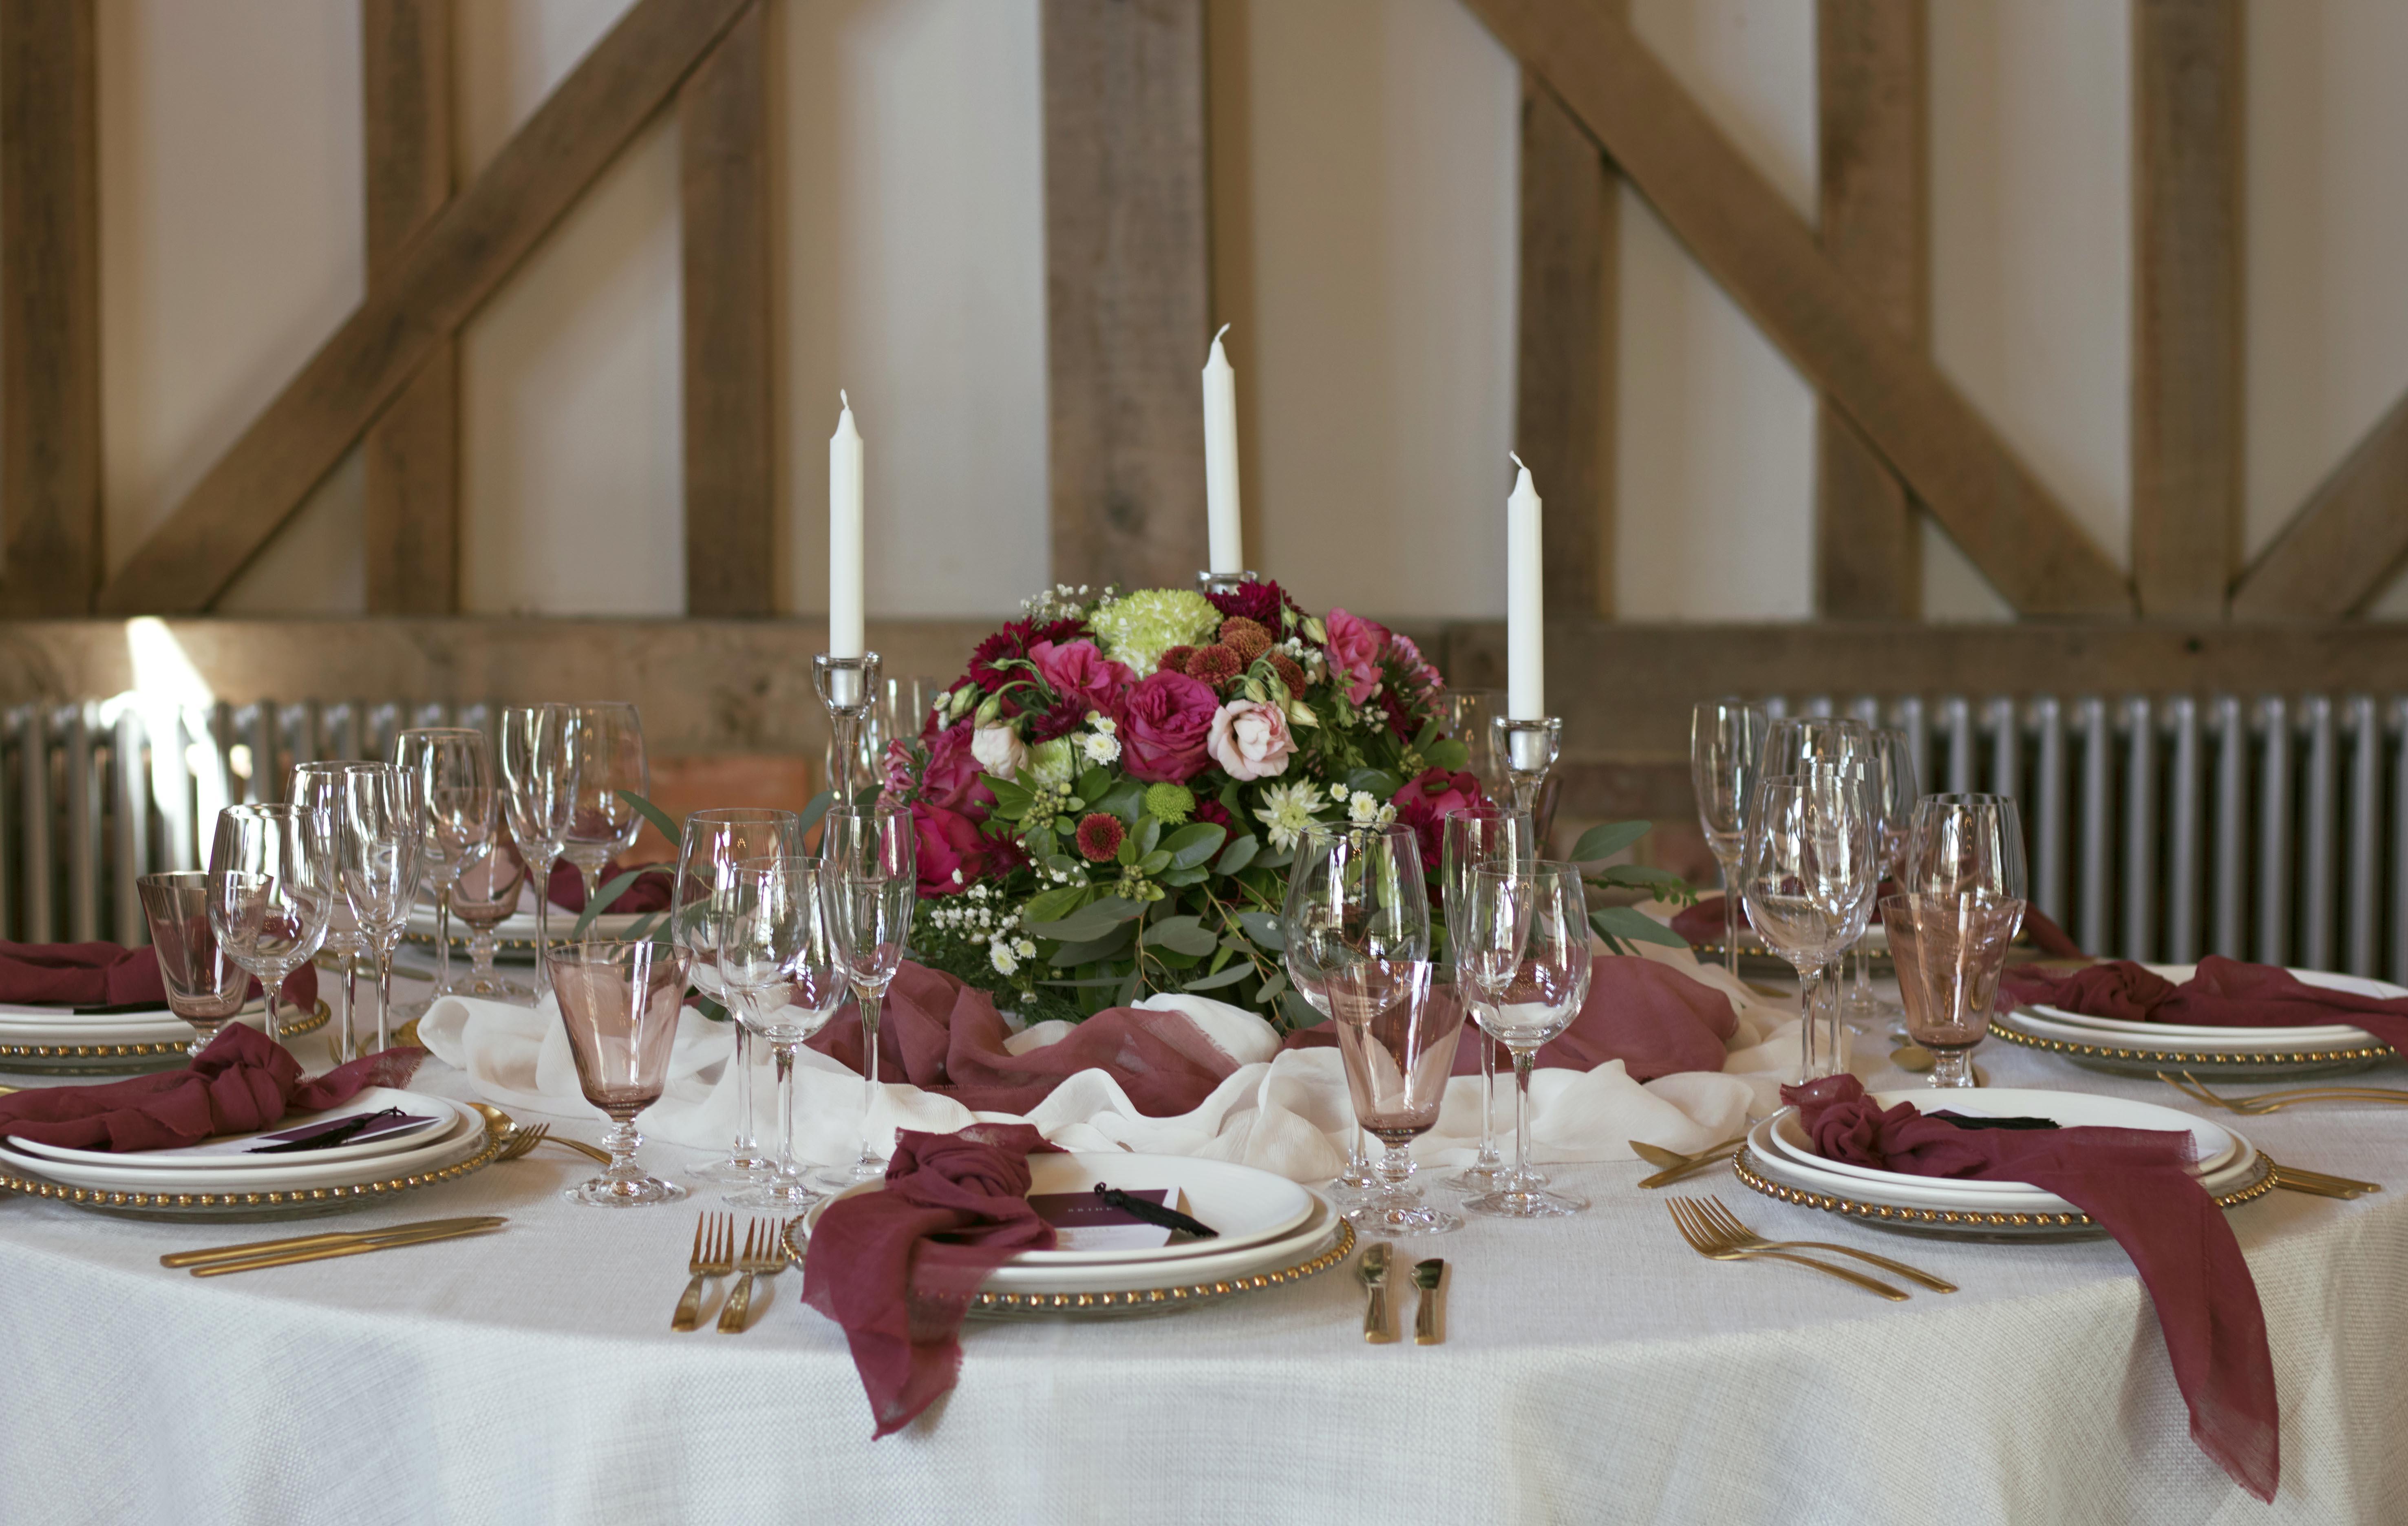 Gate Street Barn Wedding Table